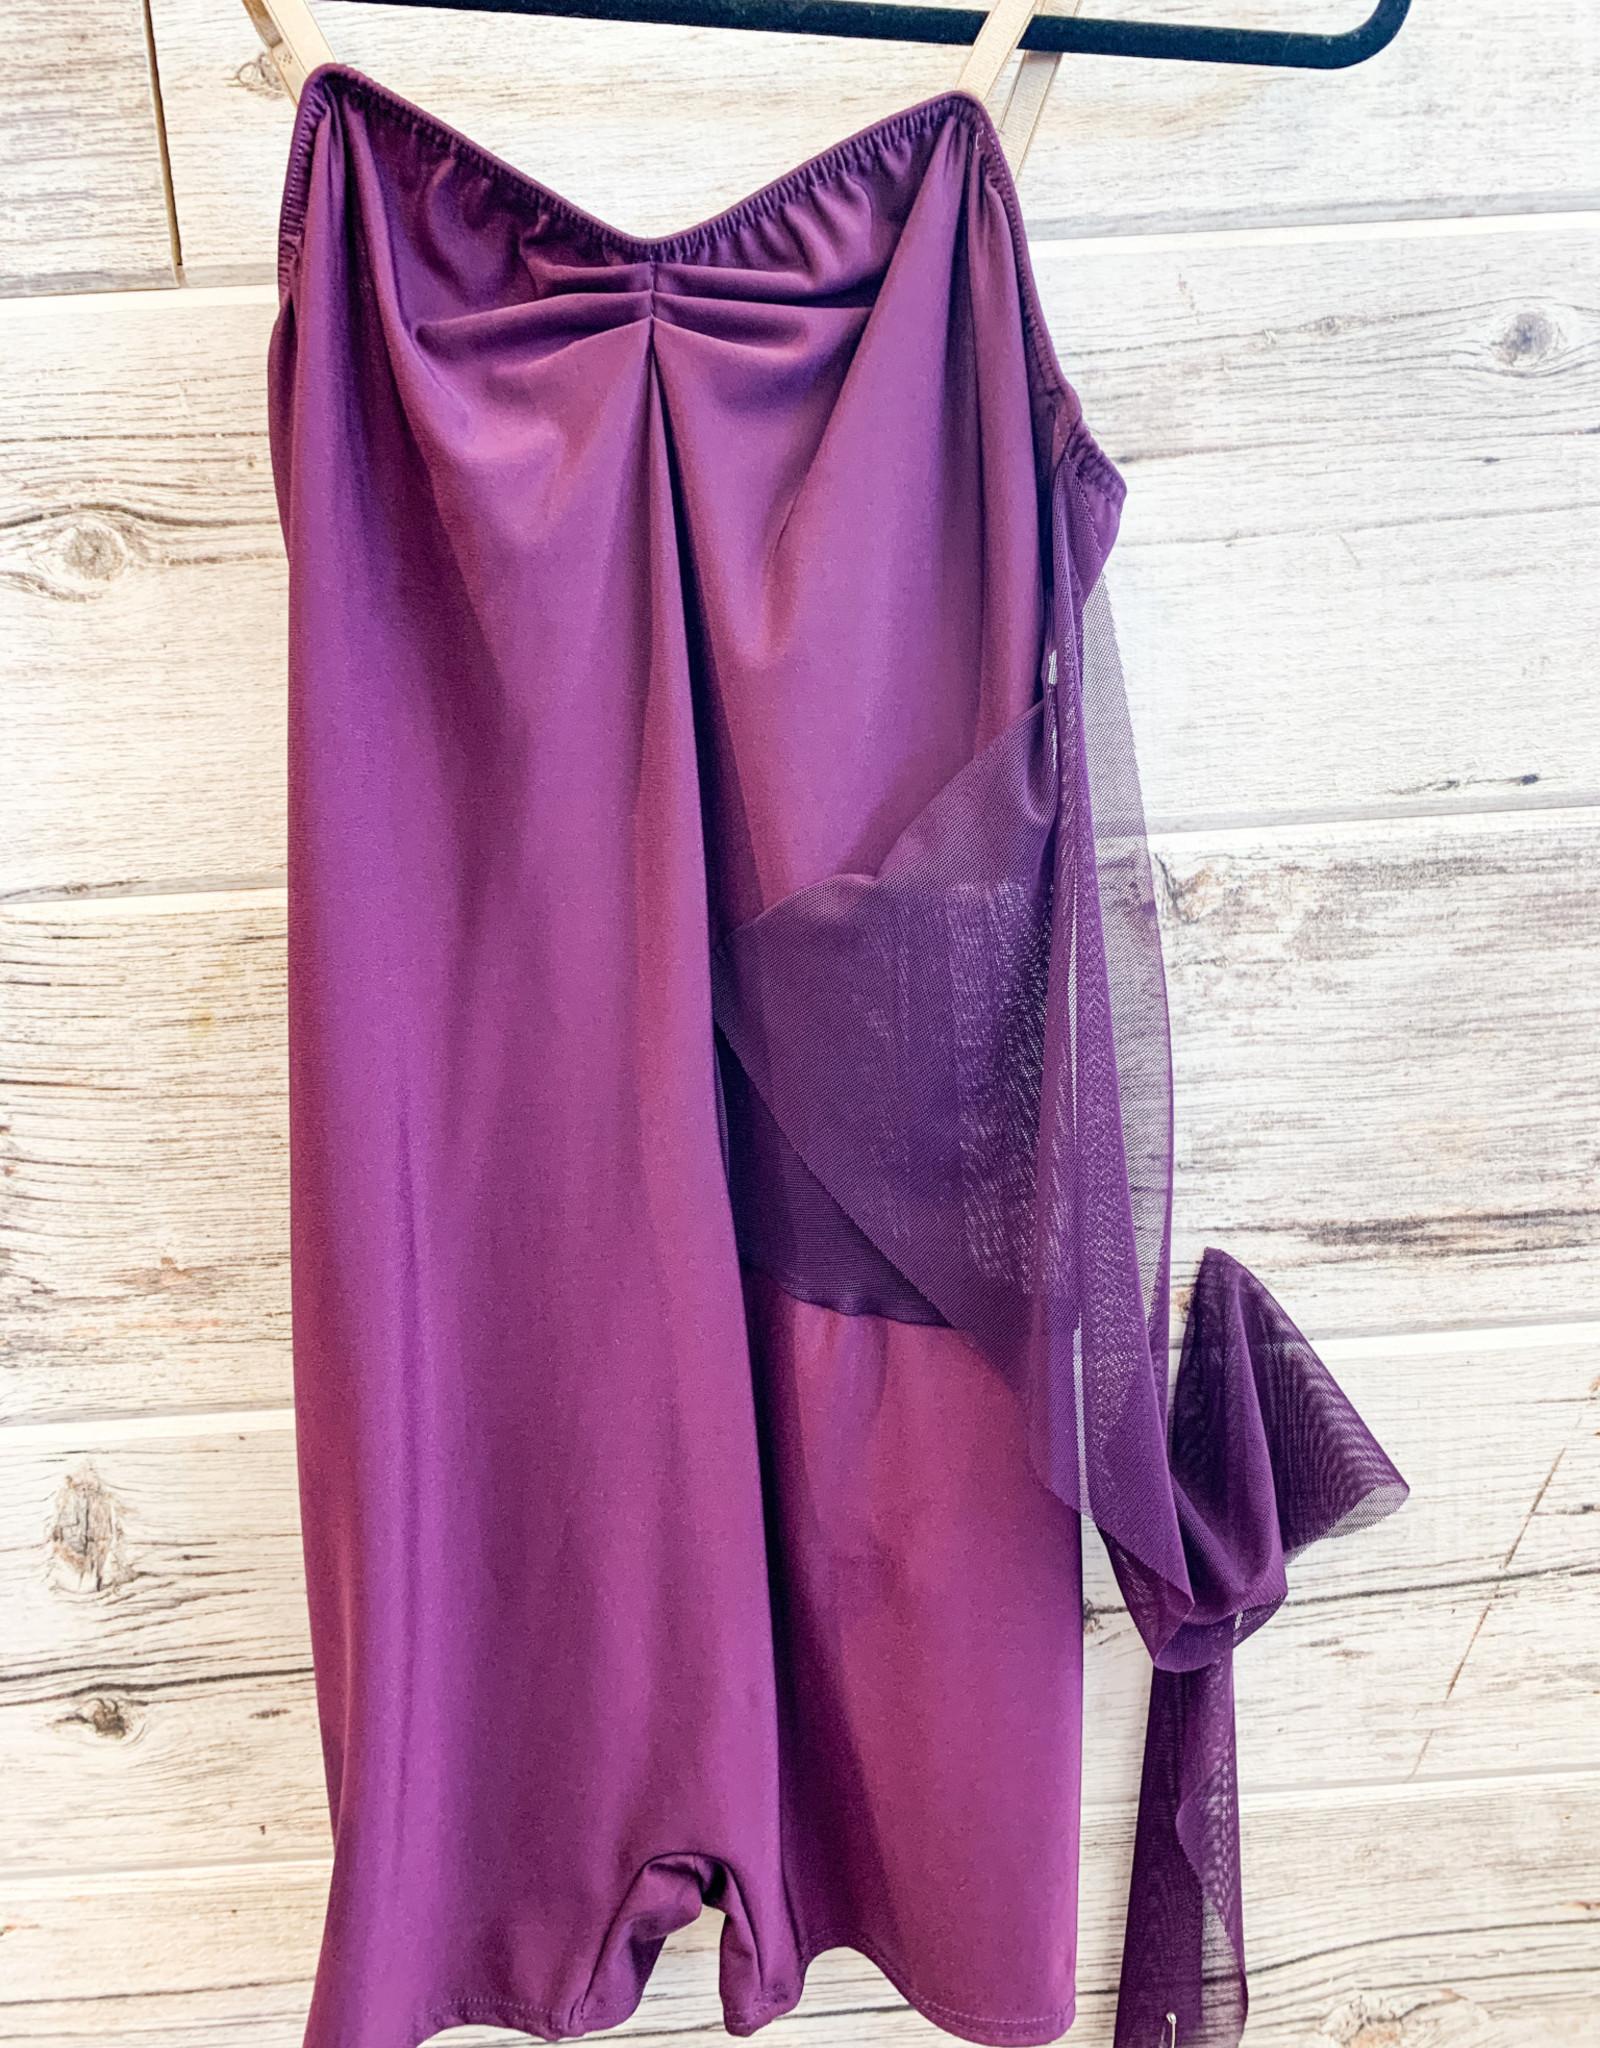 Costume Contemporain Voile Prune (Large)